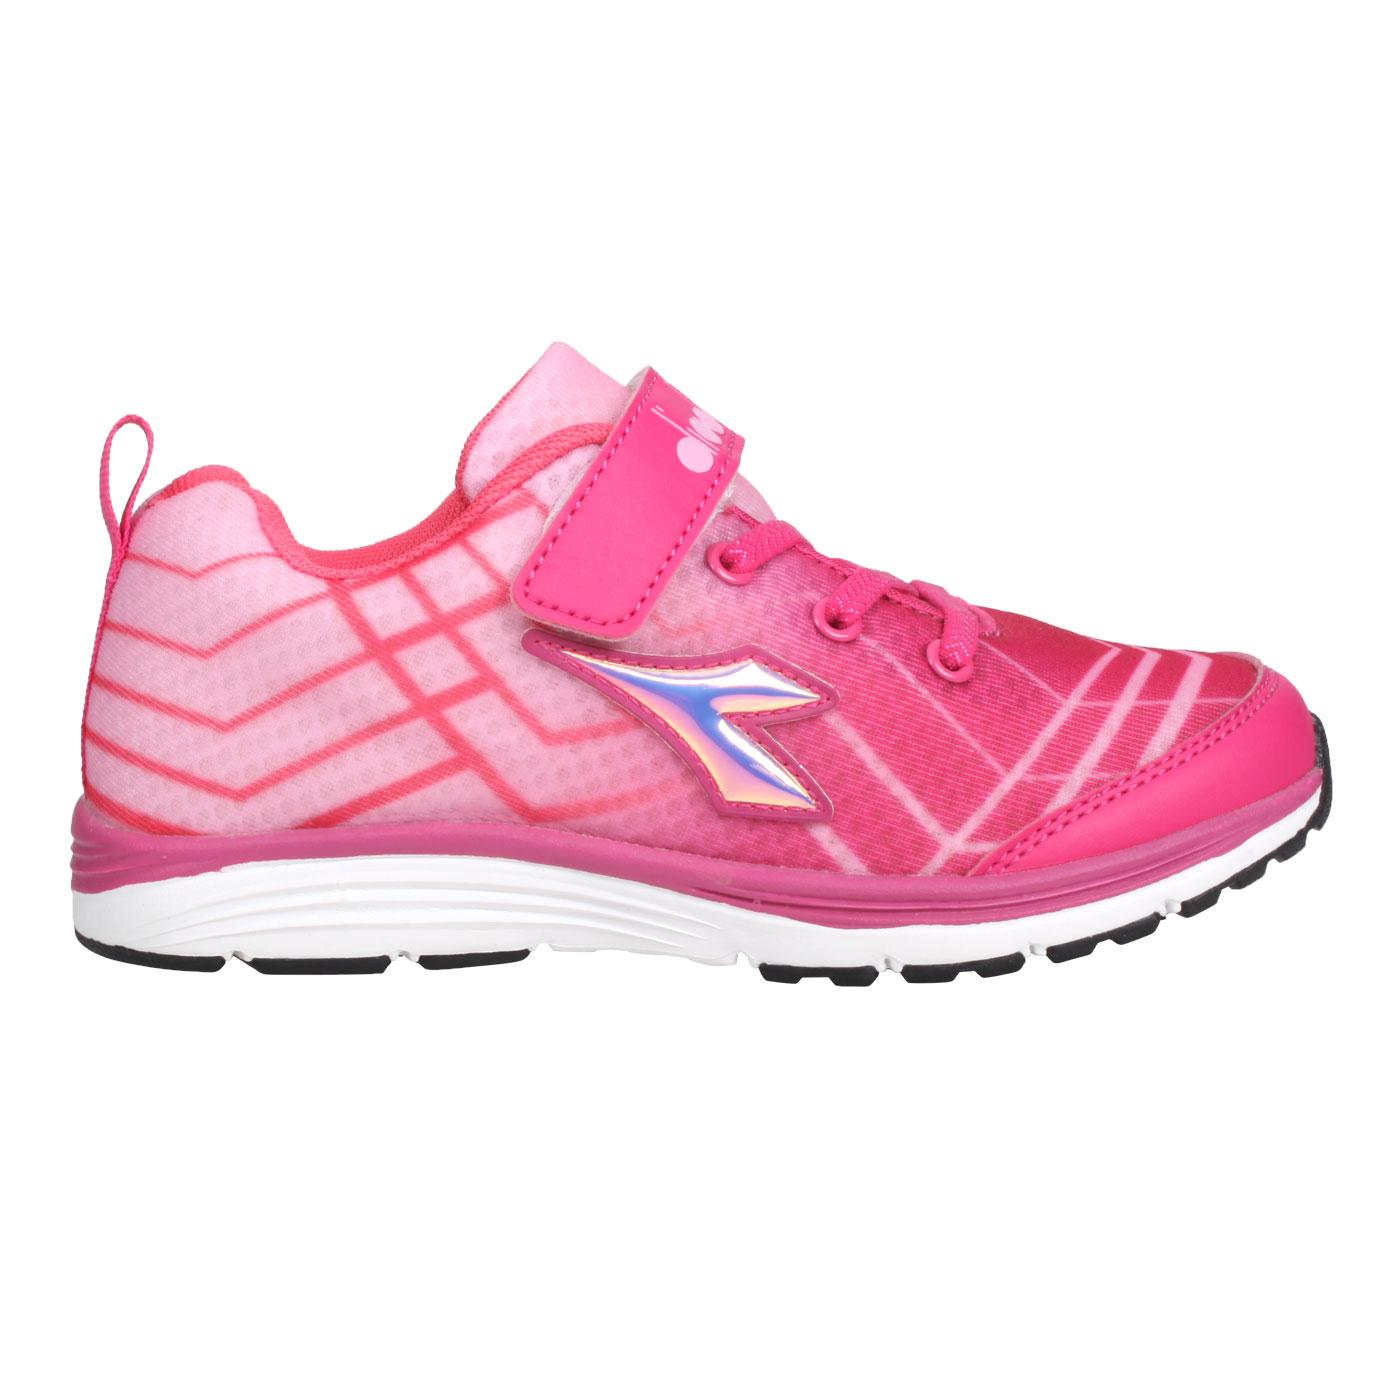 DIADORA 中童慢跑鞋-超寬楦 DA9AKR5793 - 桃紅白